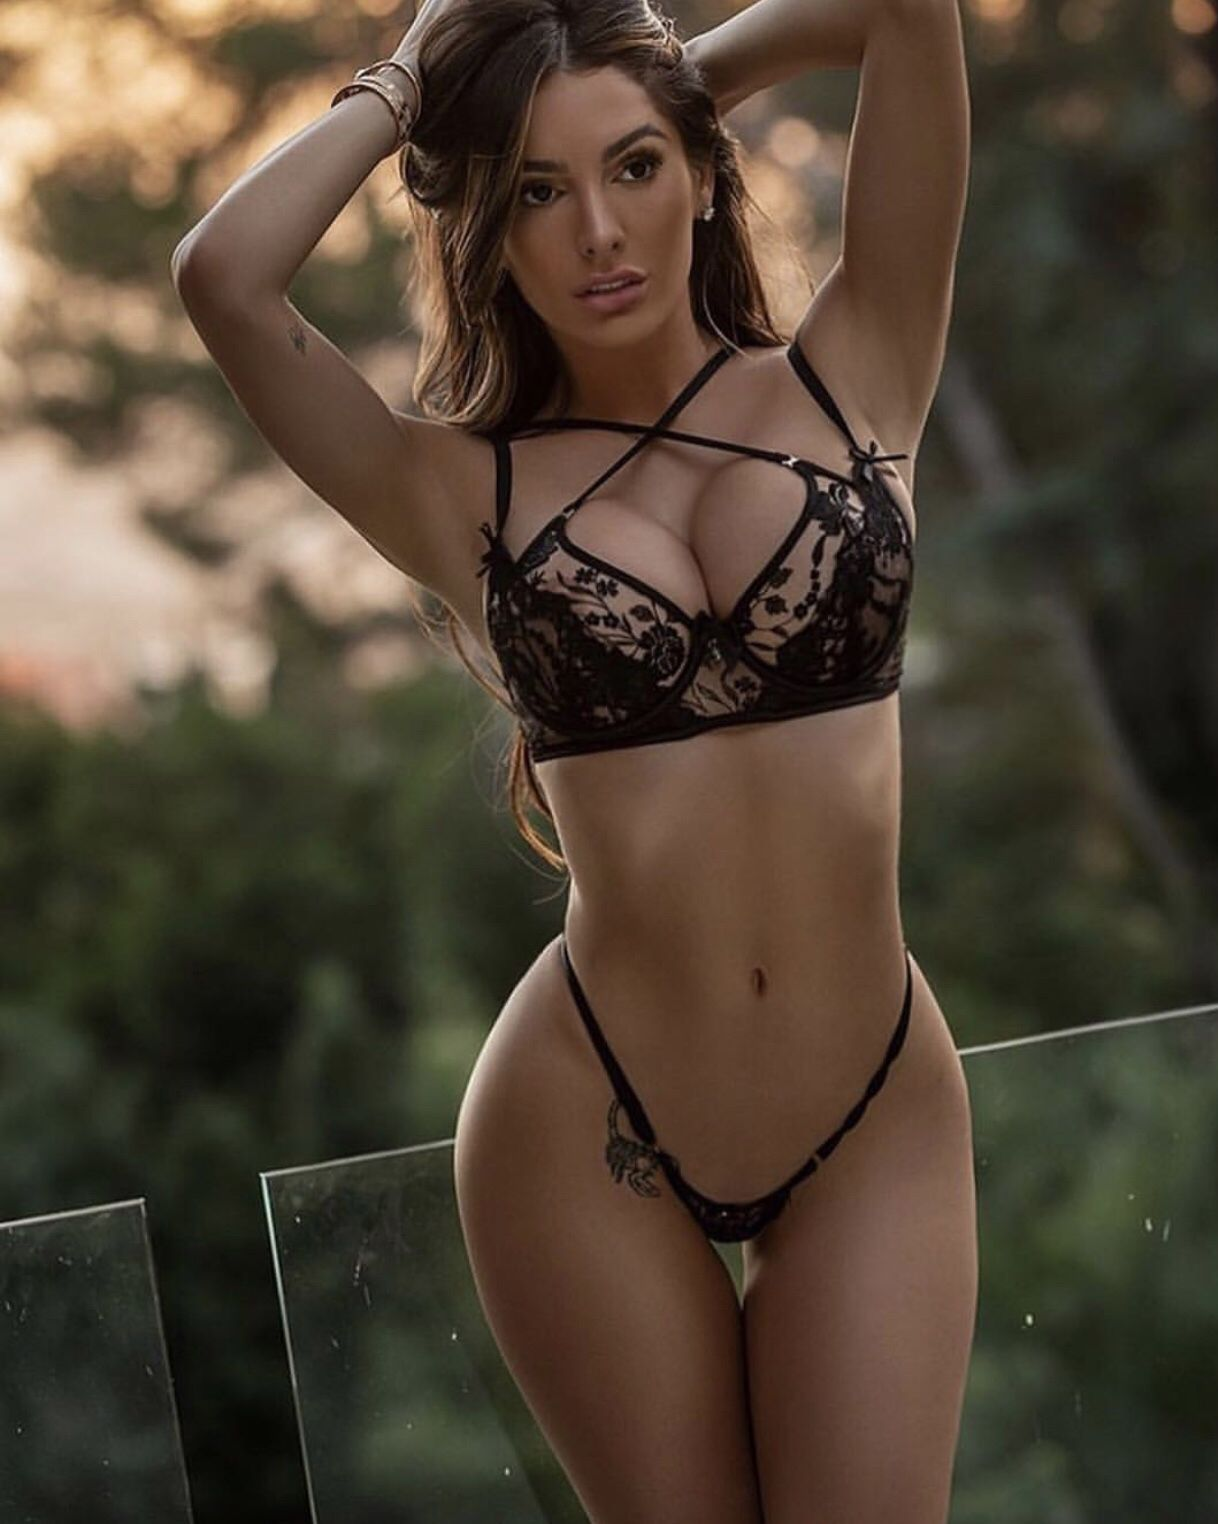 Bikini Julia Kovalchuk naked (75 photos), Tits, Bikini, Instagram, cameltoe 2019